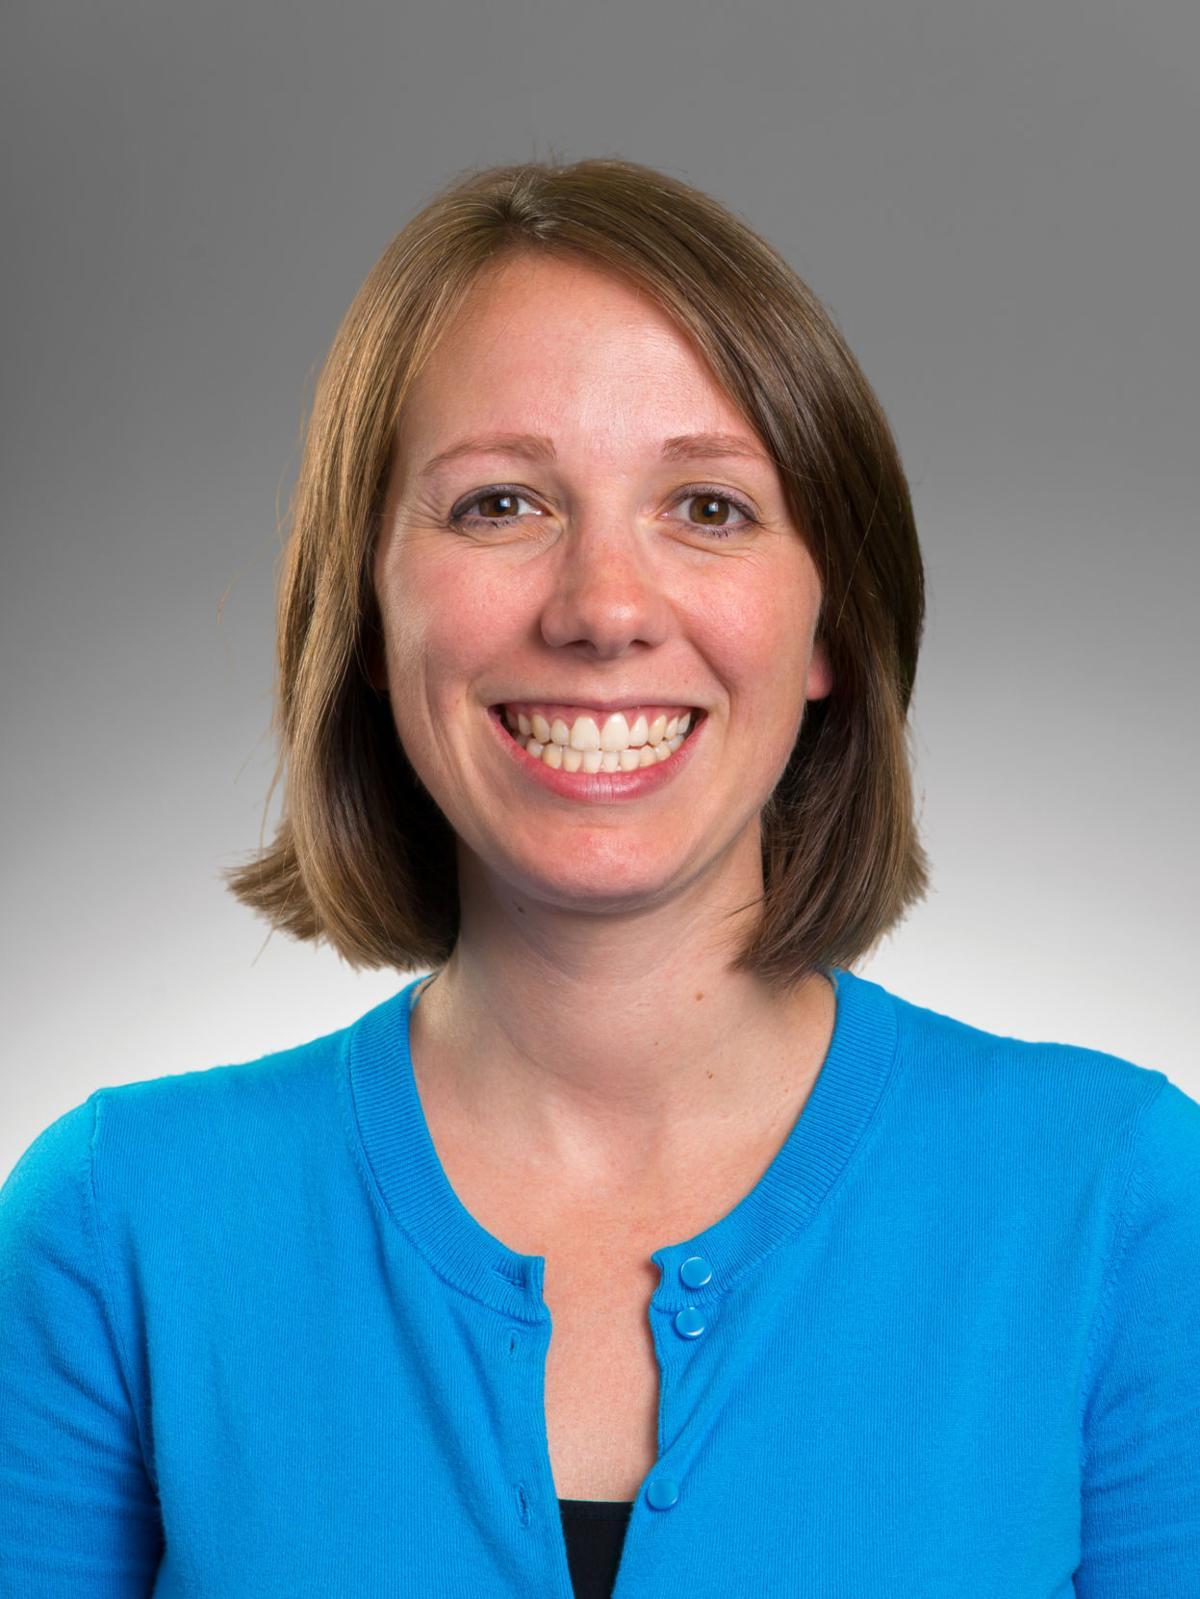 Dr. Stephanie Canham